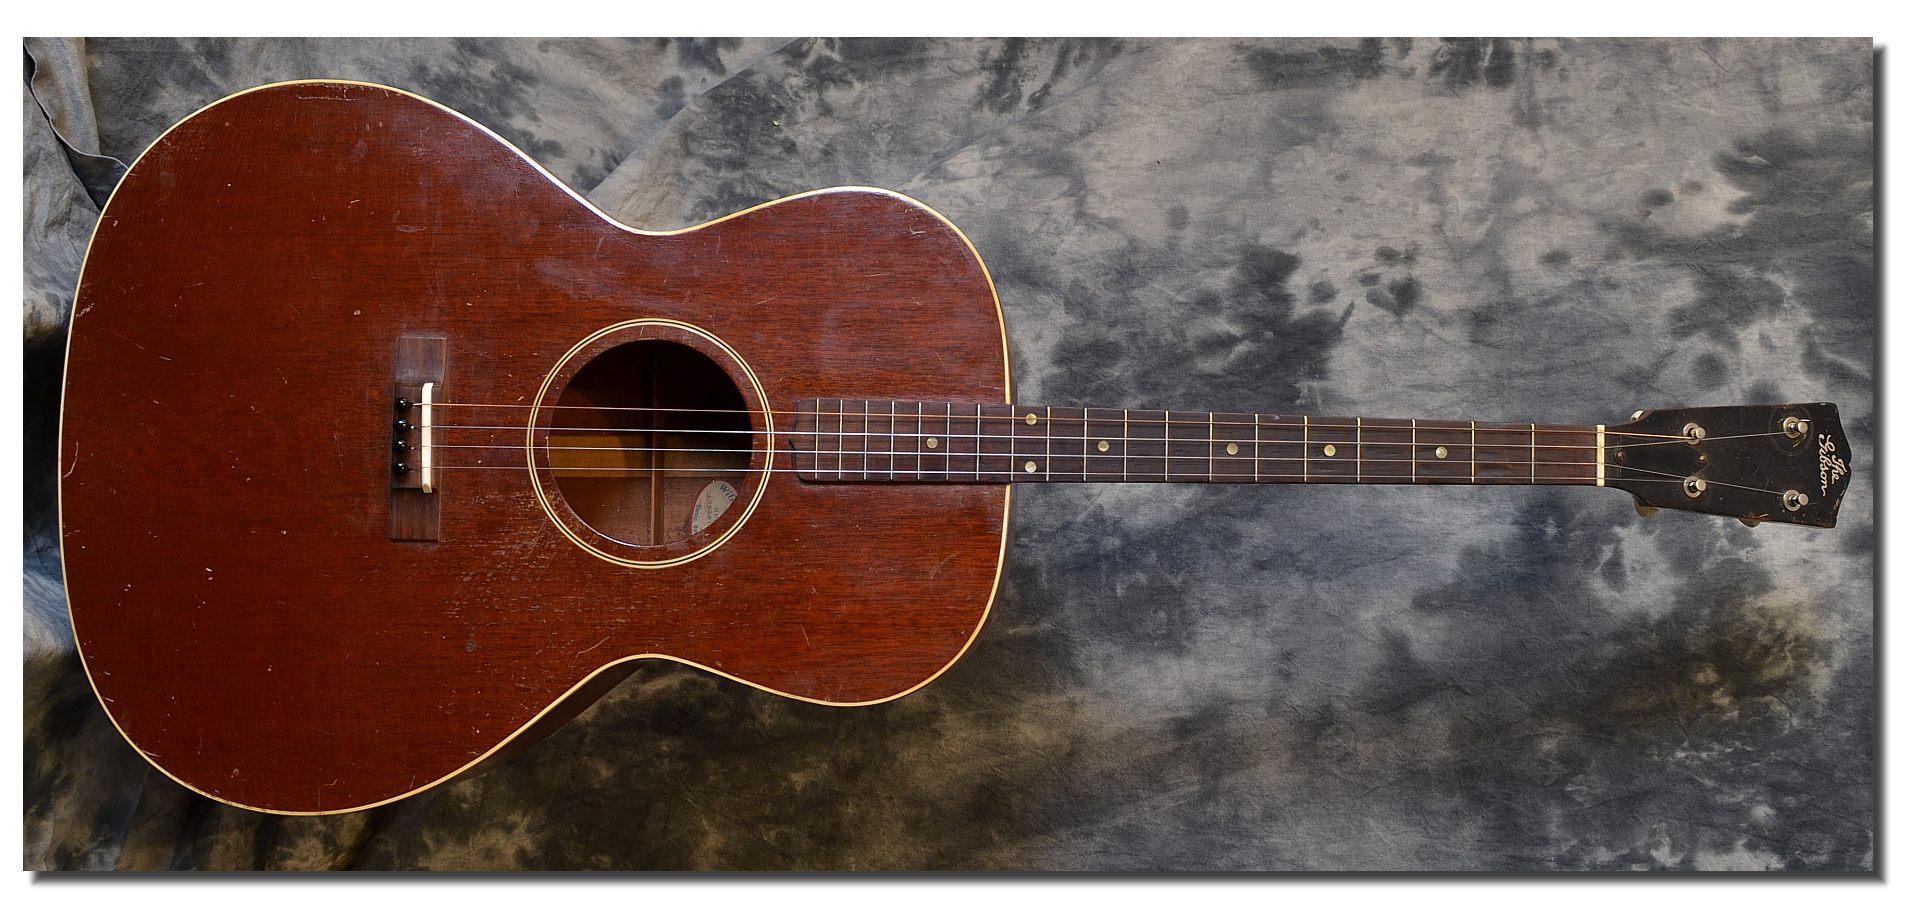 gibson tg 00 tenor guitar 1934. Black Bedroom Furniture Sets. Home Design Ideas